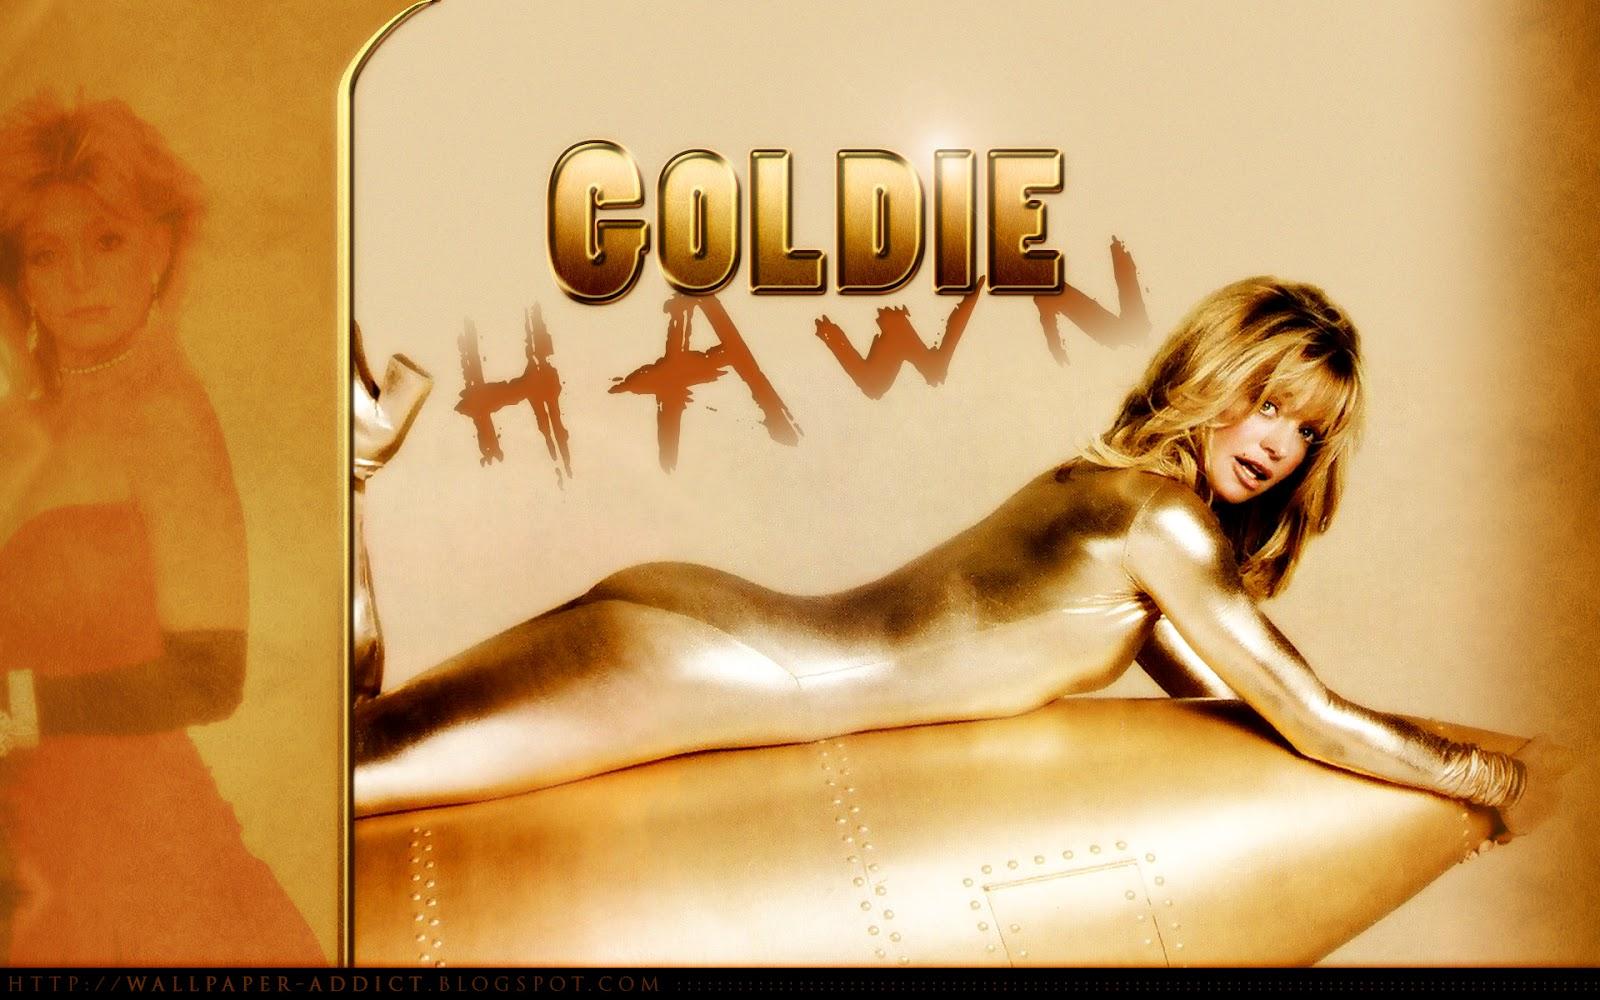 http://2.bp.blogspot.com/-l_Xyo4b67fg/T0KTRz3PnKI/AAAAAAAAA_E/WBU60pBYlVw/s1600/WALLPAPER2011_GOLDIEHAWN.jpg